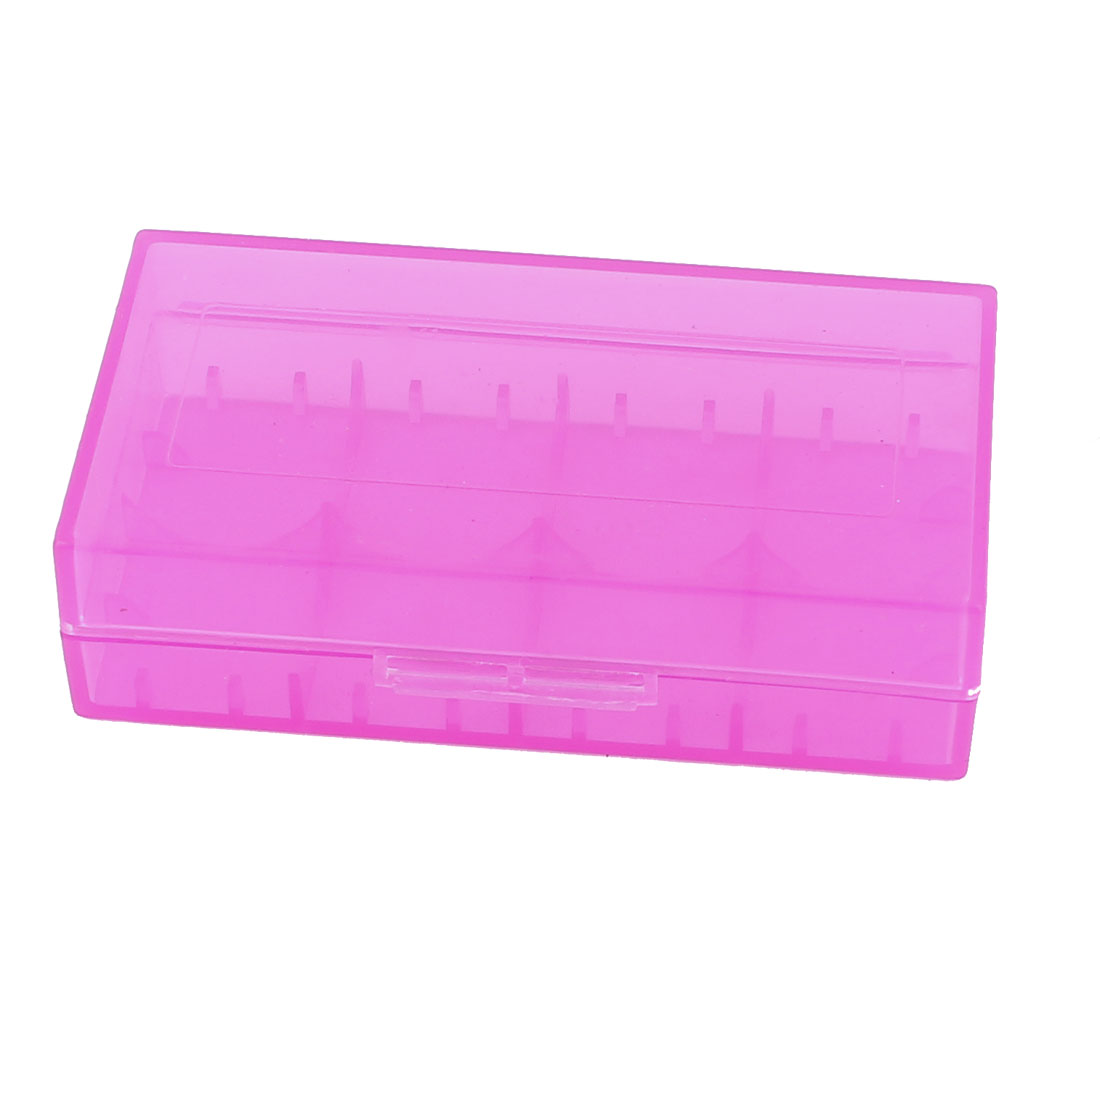 Hard Plastic Case Holder Storage Box Purple for 18650 16430 CR123A Battery